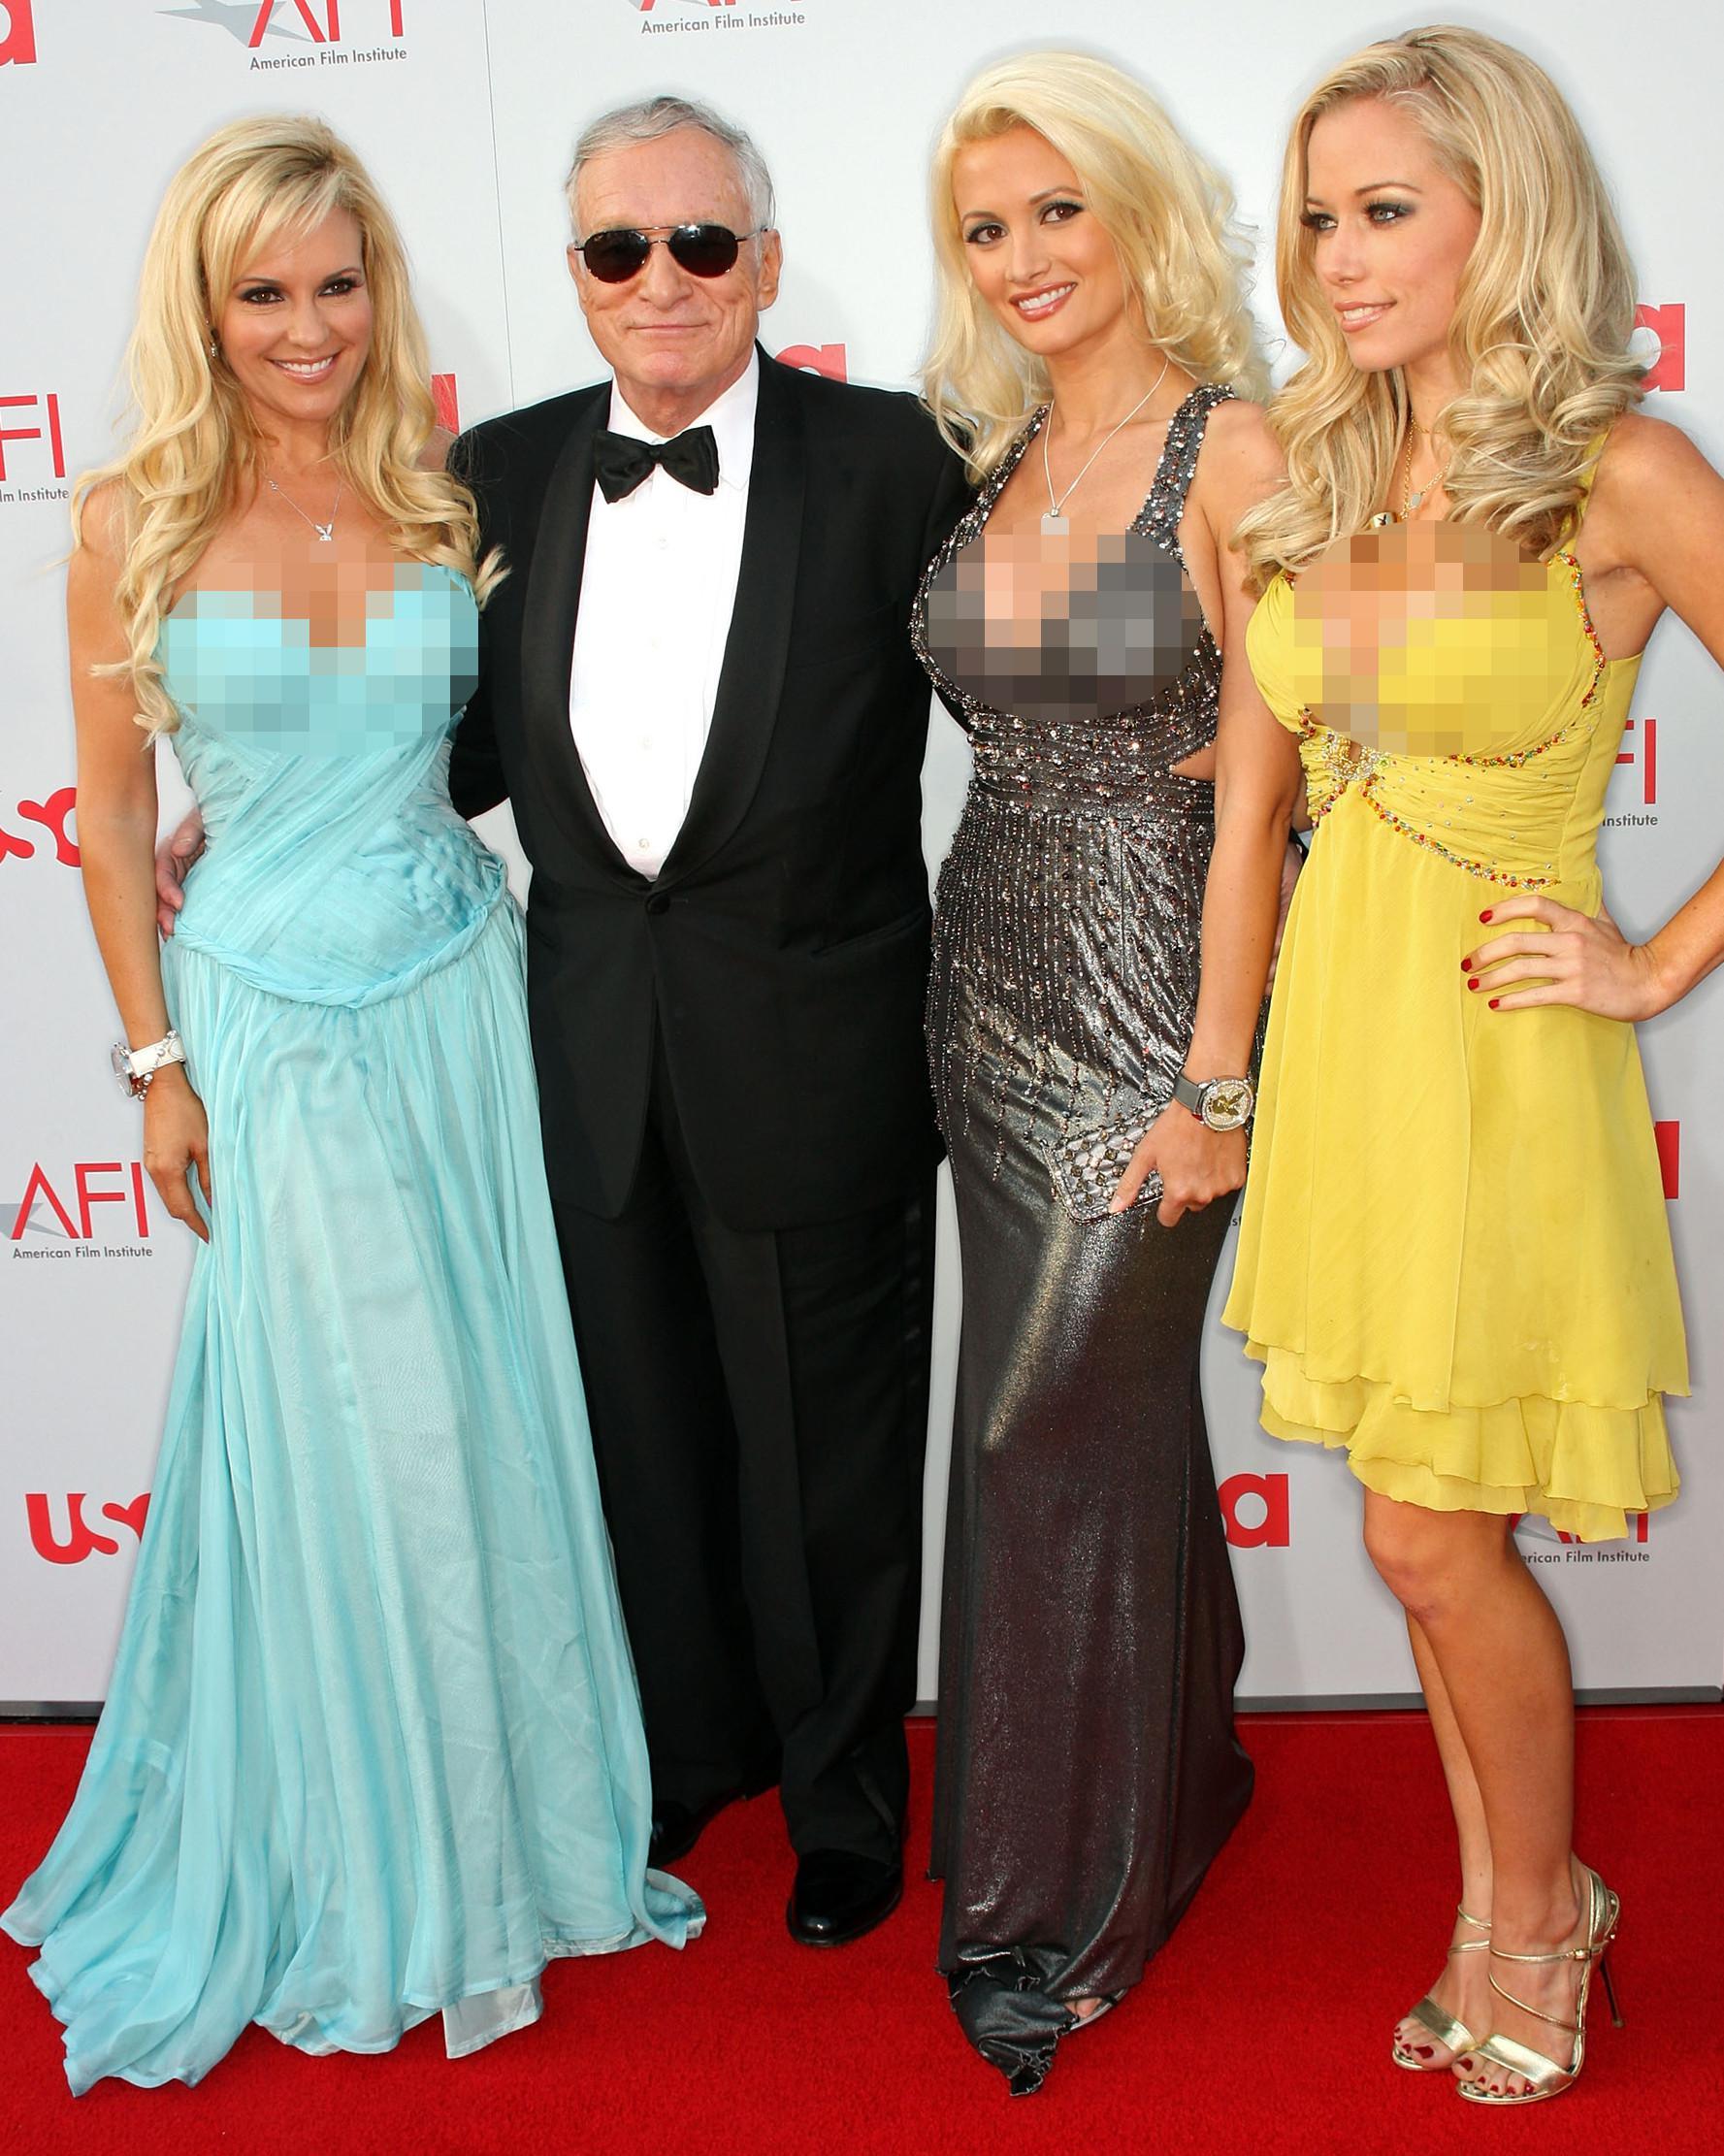 Hugh Hefner bersama Holly Madison Bridget Marquardt dan Kendra Wilkinson menghadiri pemutaran perdana